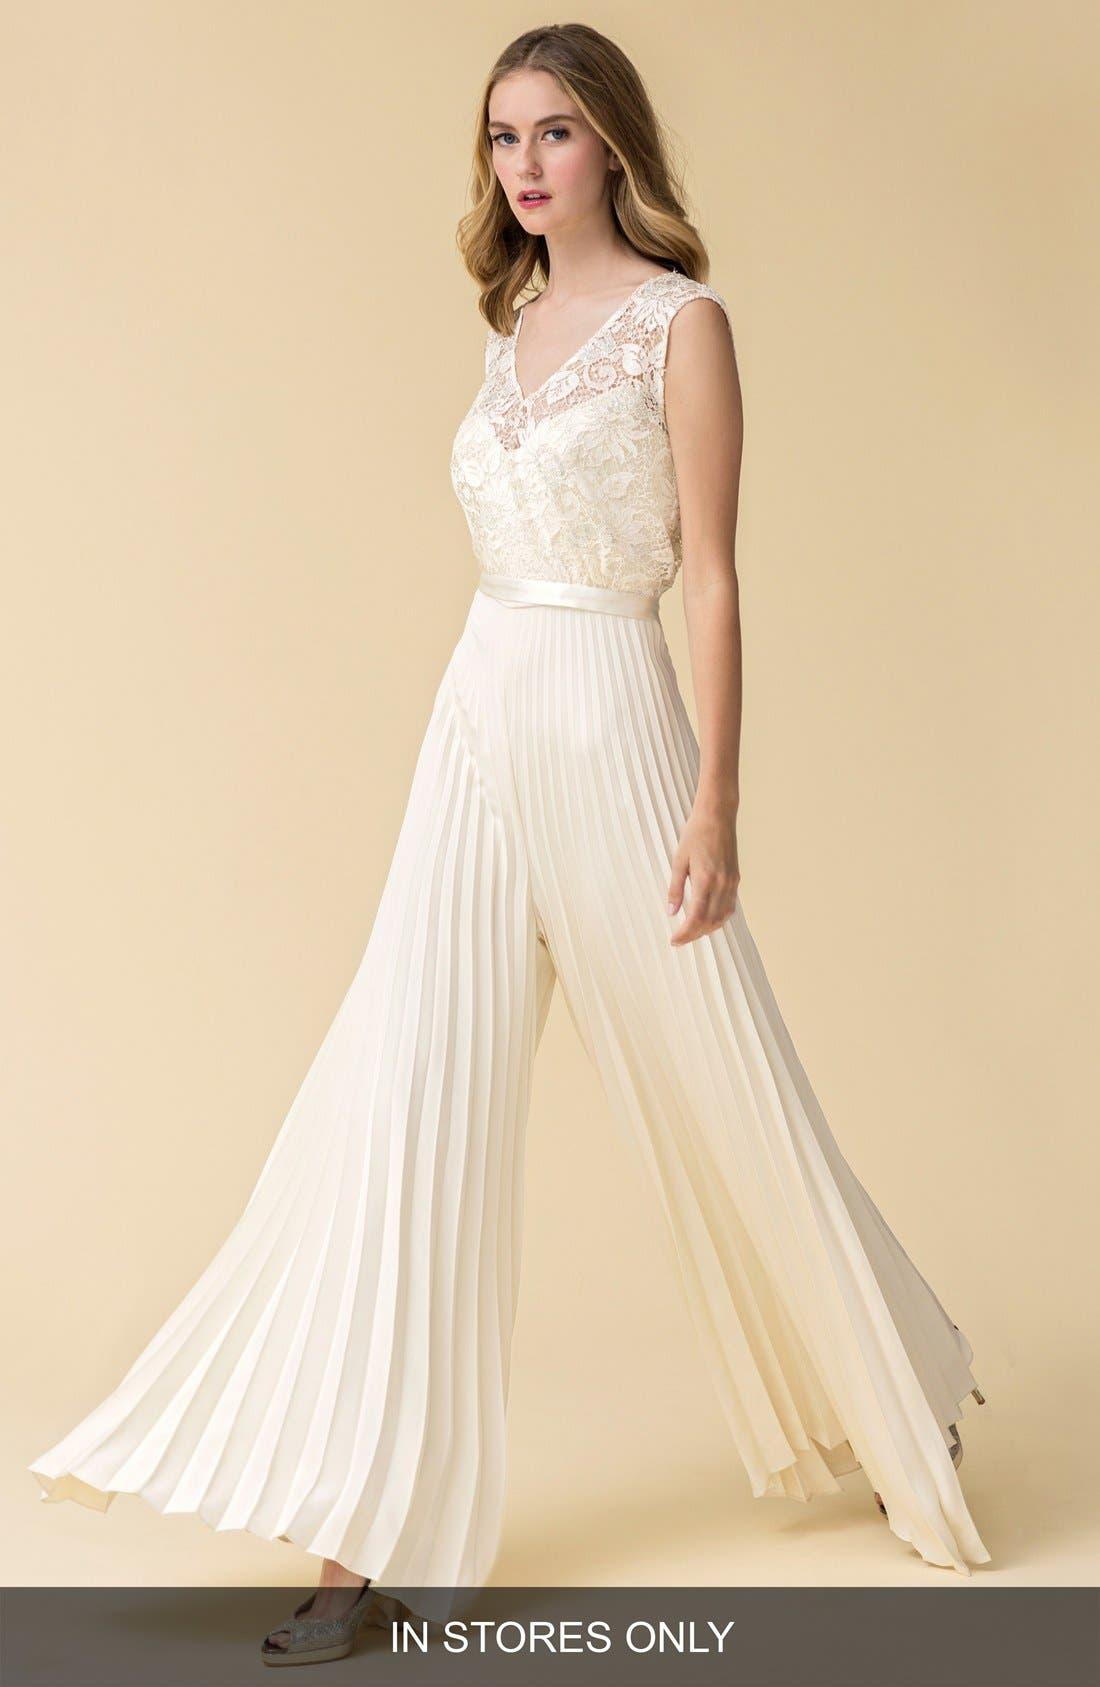 Caroline DeVillo 'Audrey' Pleat Wide Leg Silk Jumpsuit (In Stores Only)